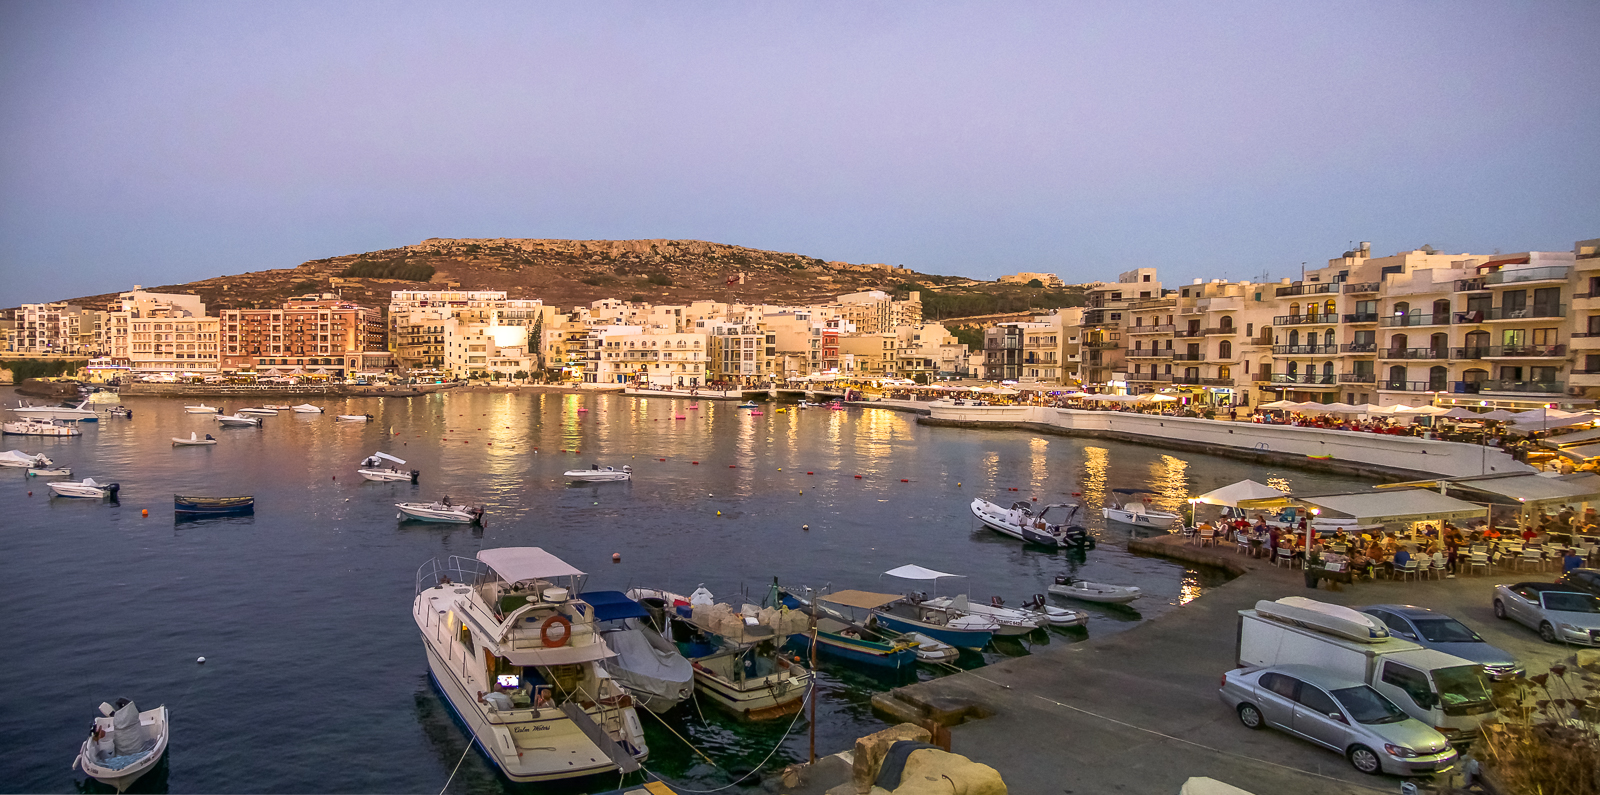 Masalforn Bay, Gozo, Malta